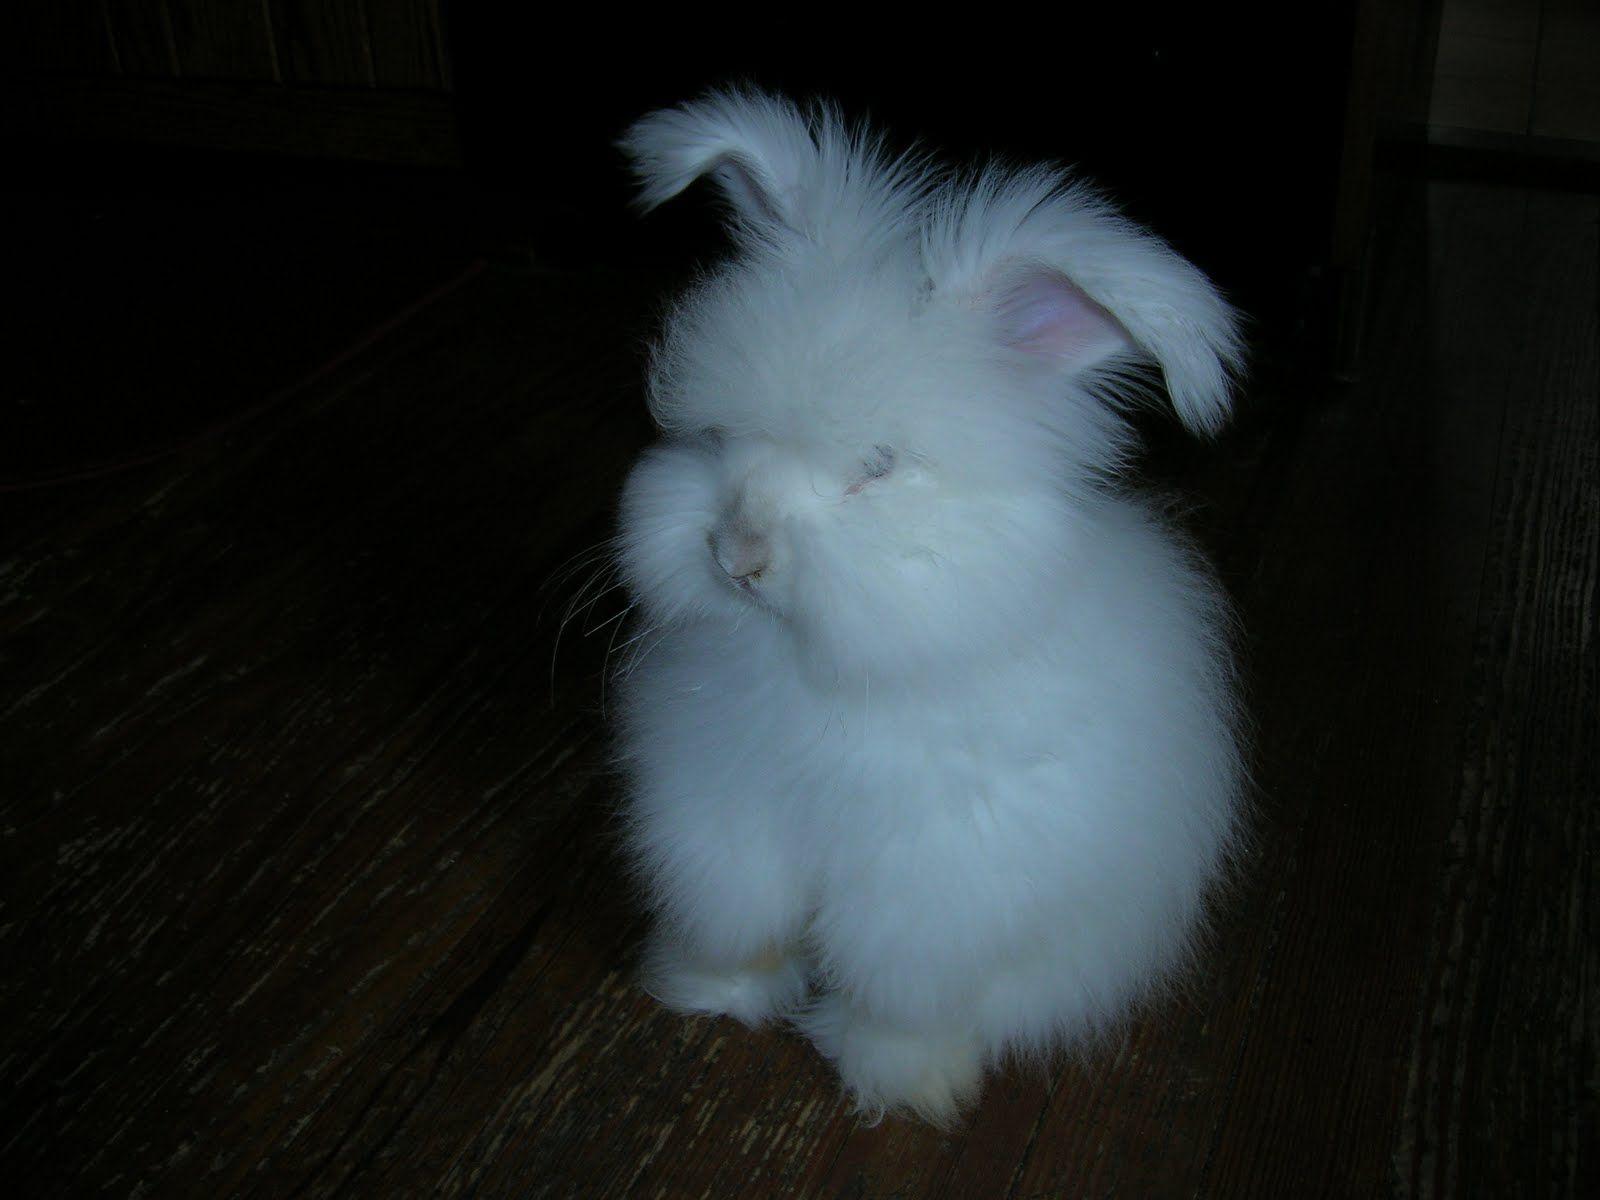 Angora Bunny.  ADORABLE!!!! It looks like a stuffed animal bunny!